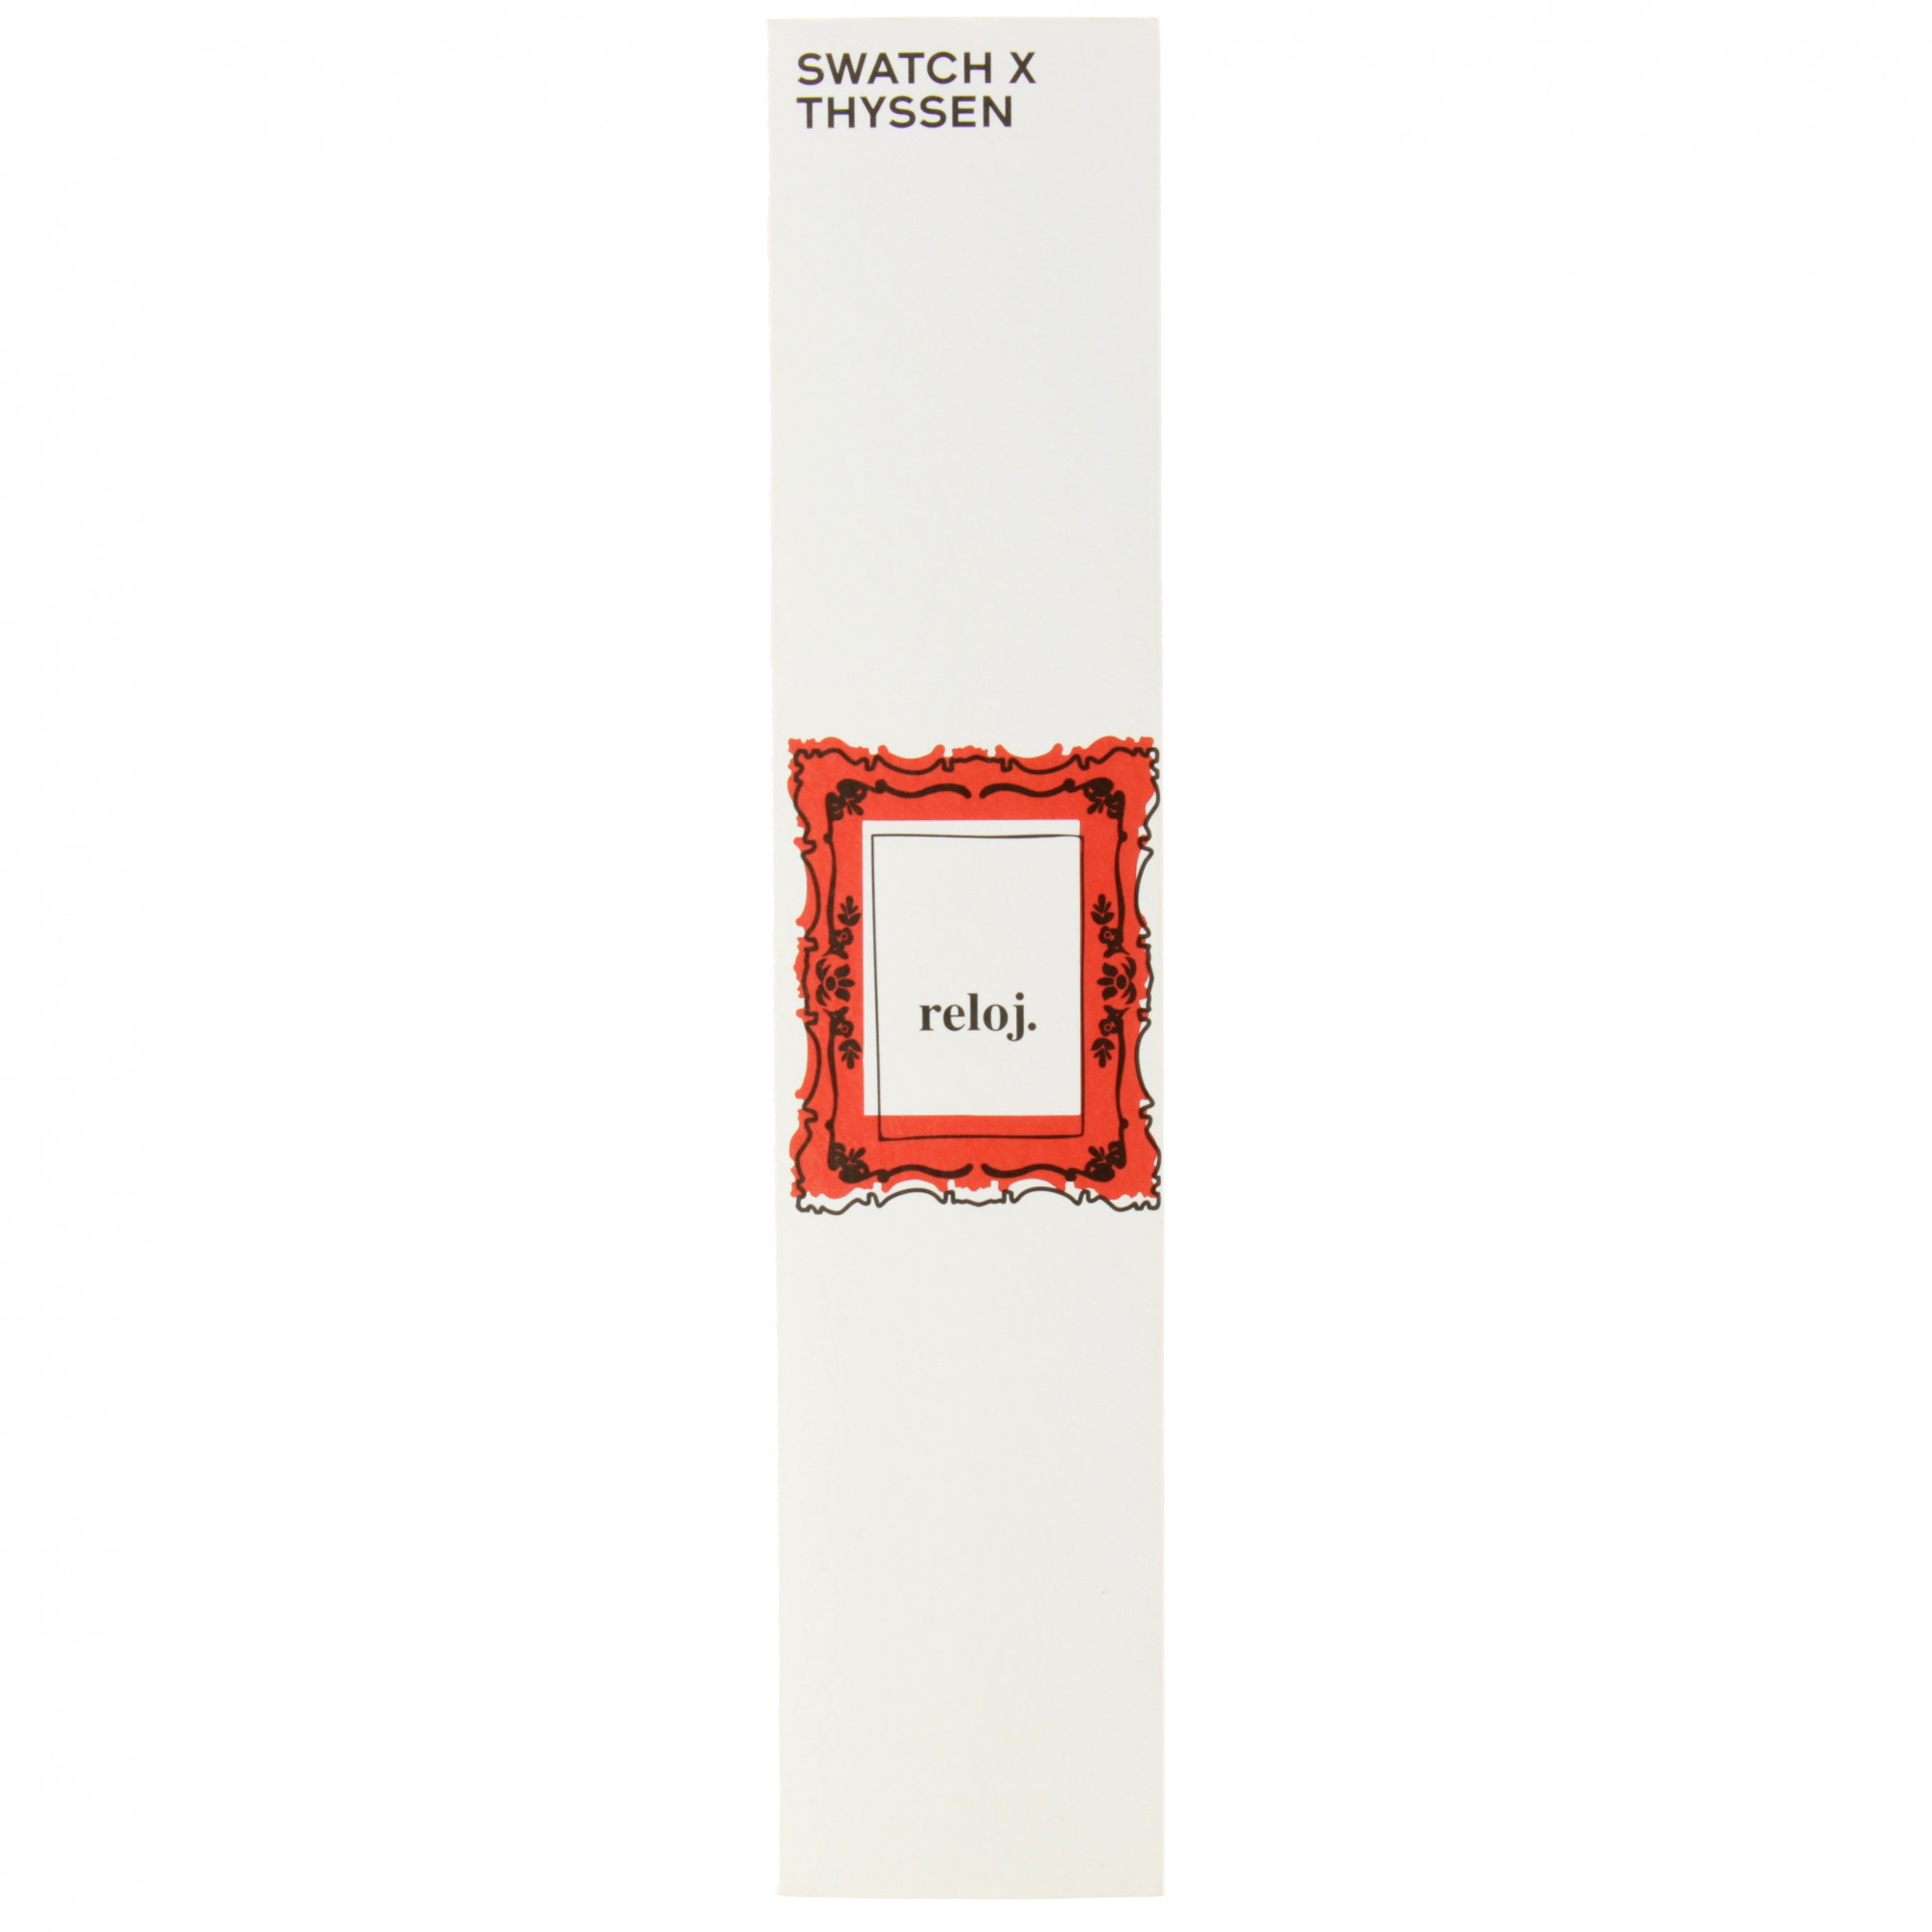 zoom Reloj Swatch x Thyssen Mondrian The Red Shiny Line